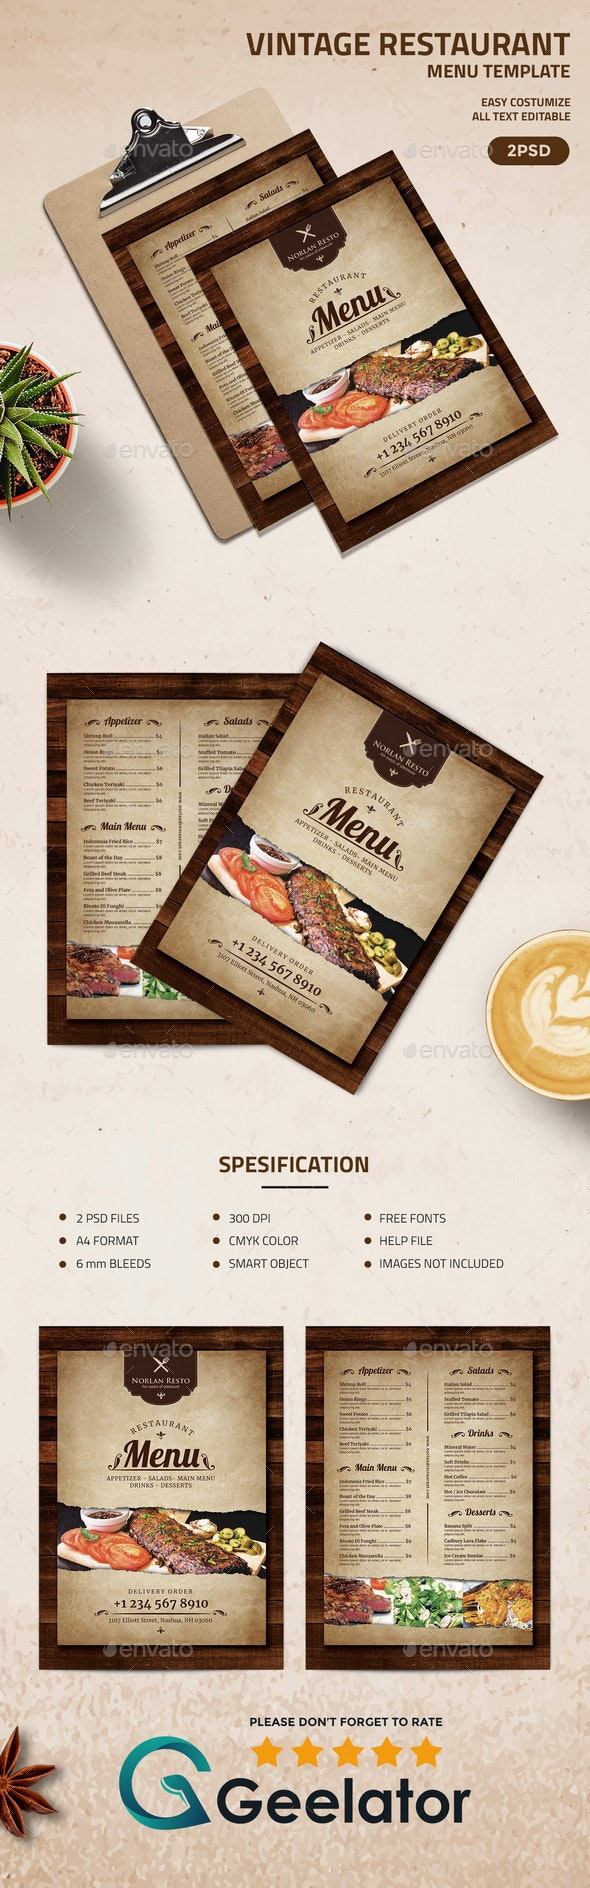 Vintage Restaurant Menu Template - Food Menus Print Templates